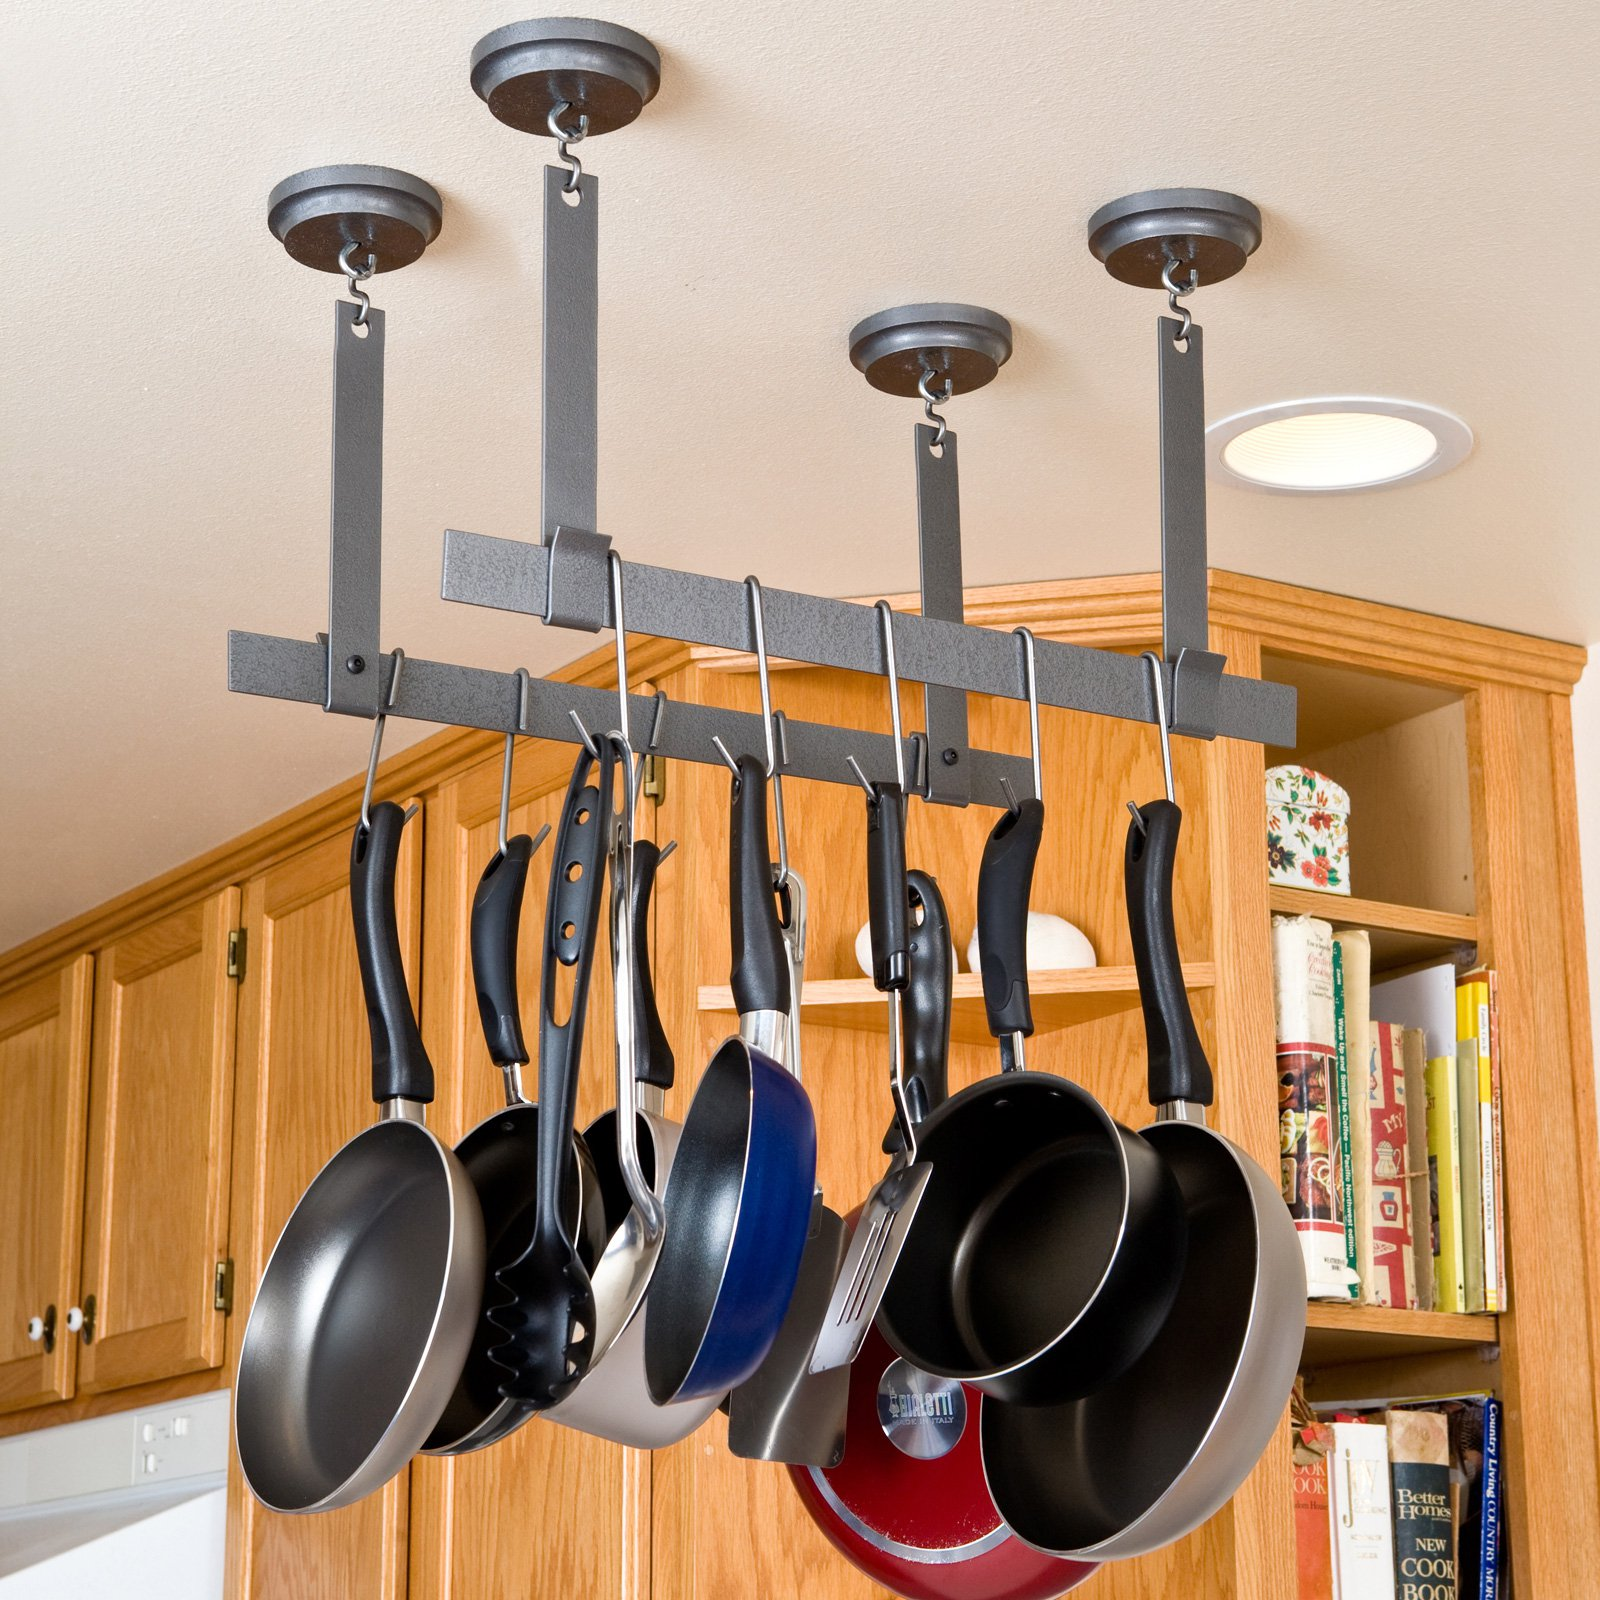 rack it up ceiling bars pot rack